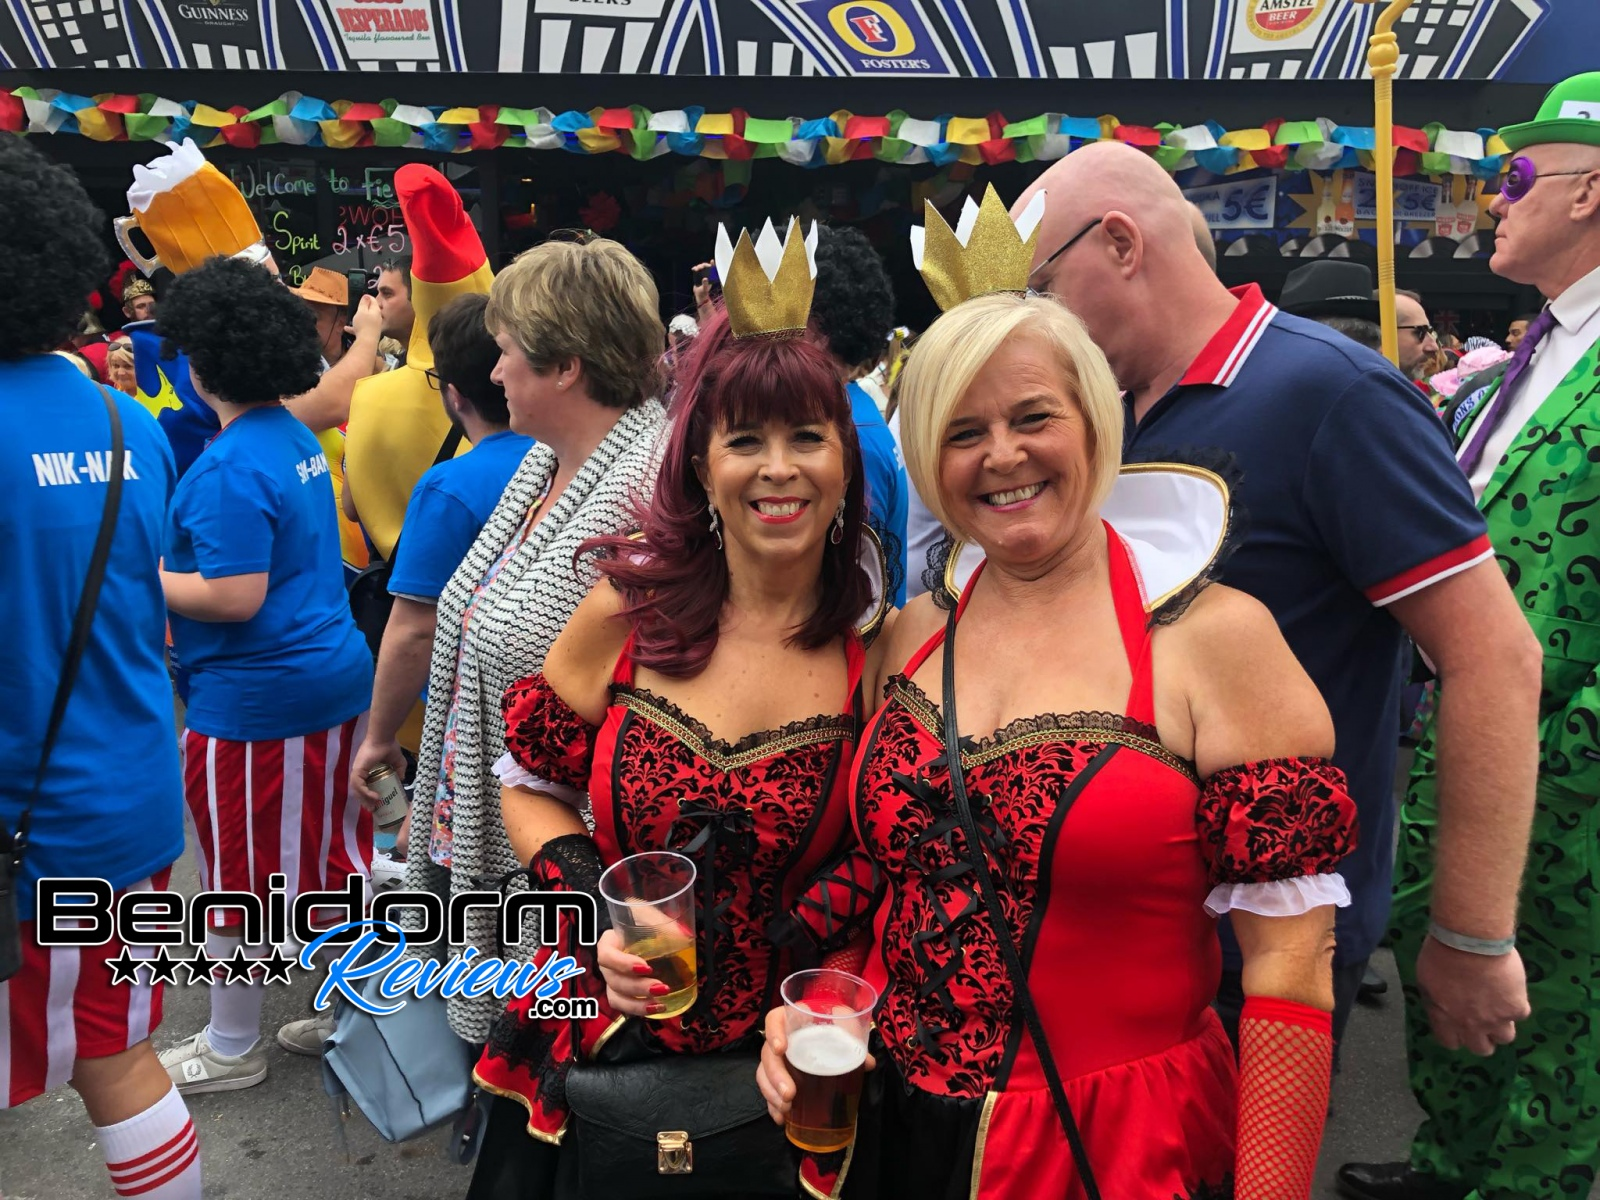 Benidorm-Fiestas-2019-Fancy-Dress-229